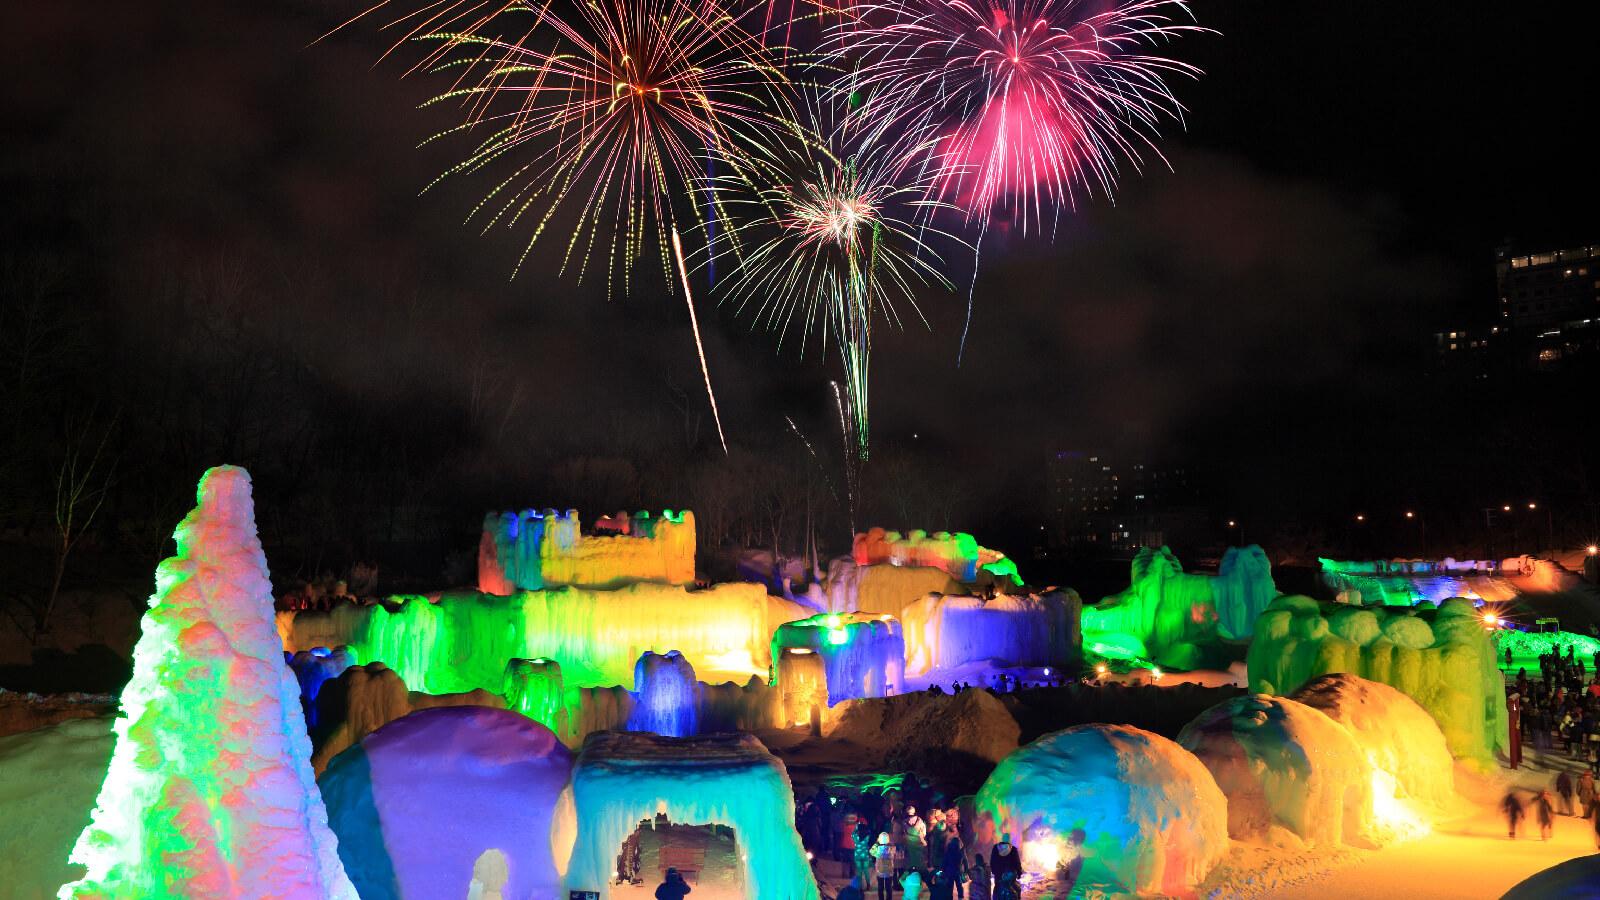 A Colorful Winter Ravine in Sounkyo: Ice Fall Festival